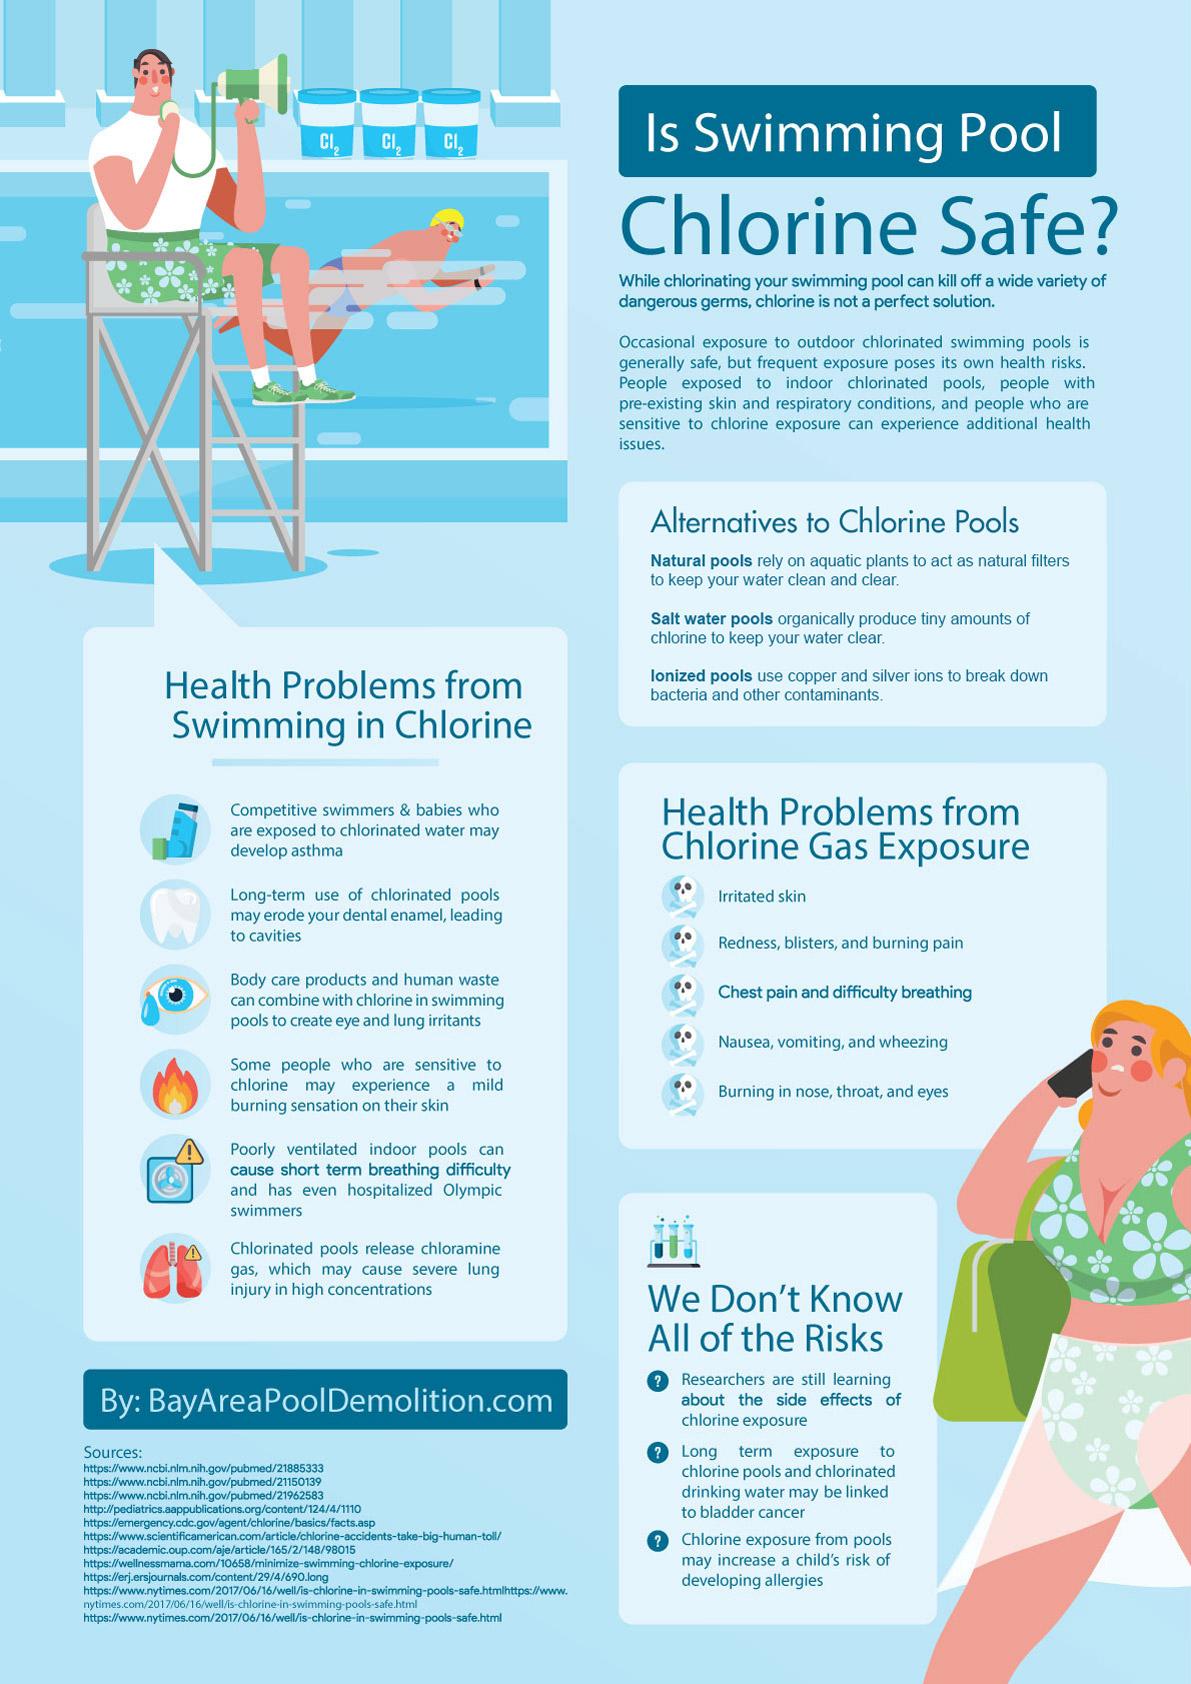 Is swimming pool chlorine safe bay area pool demolition - Dangers of chlorine in swimming pools ...